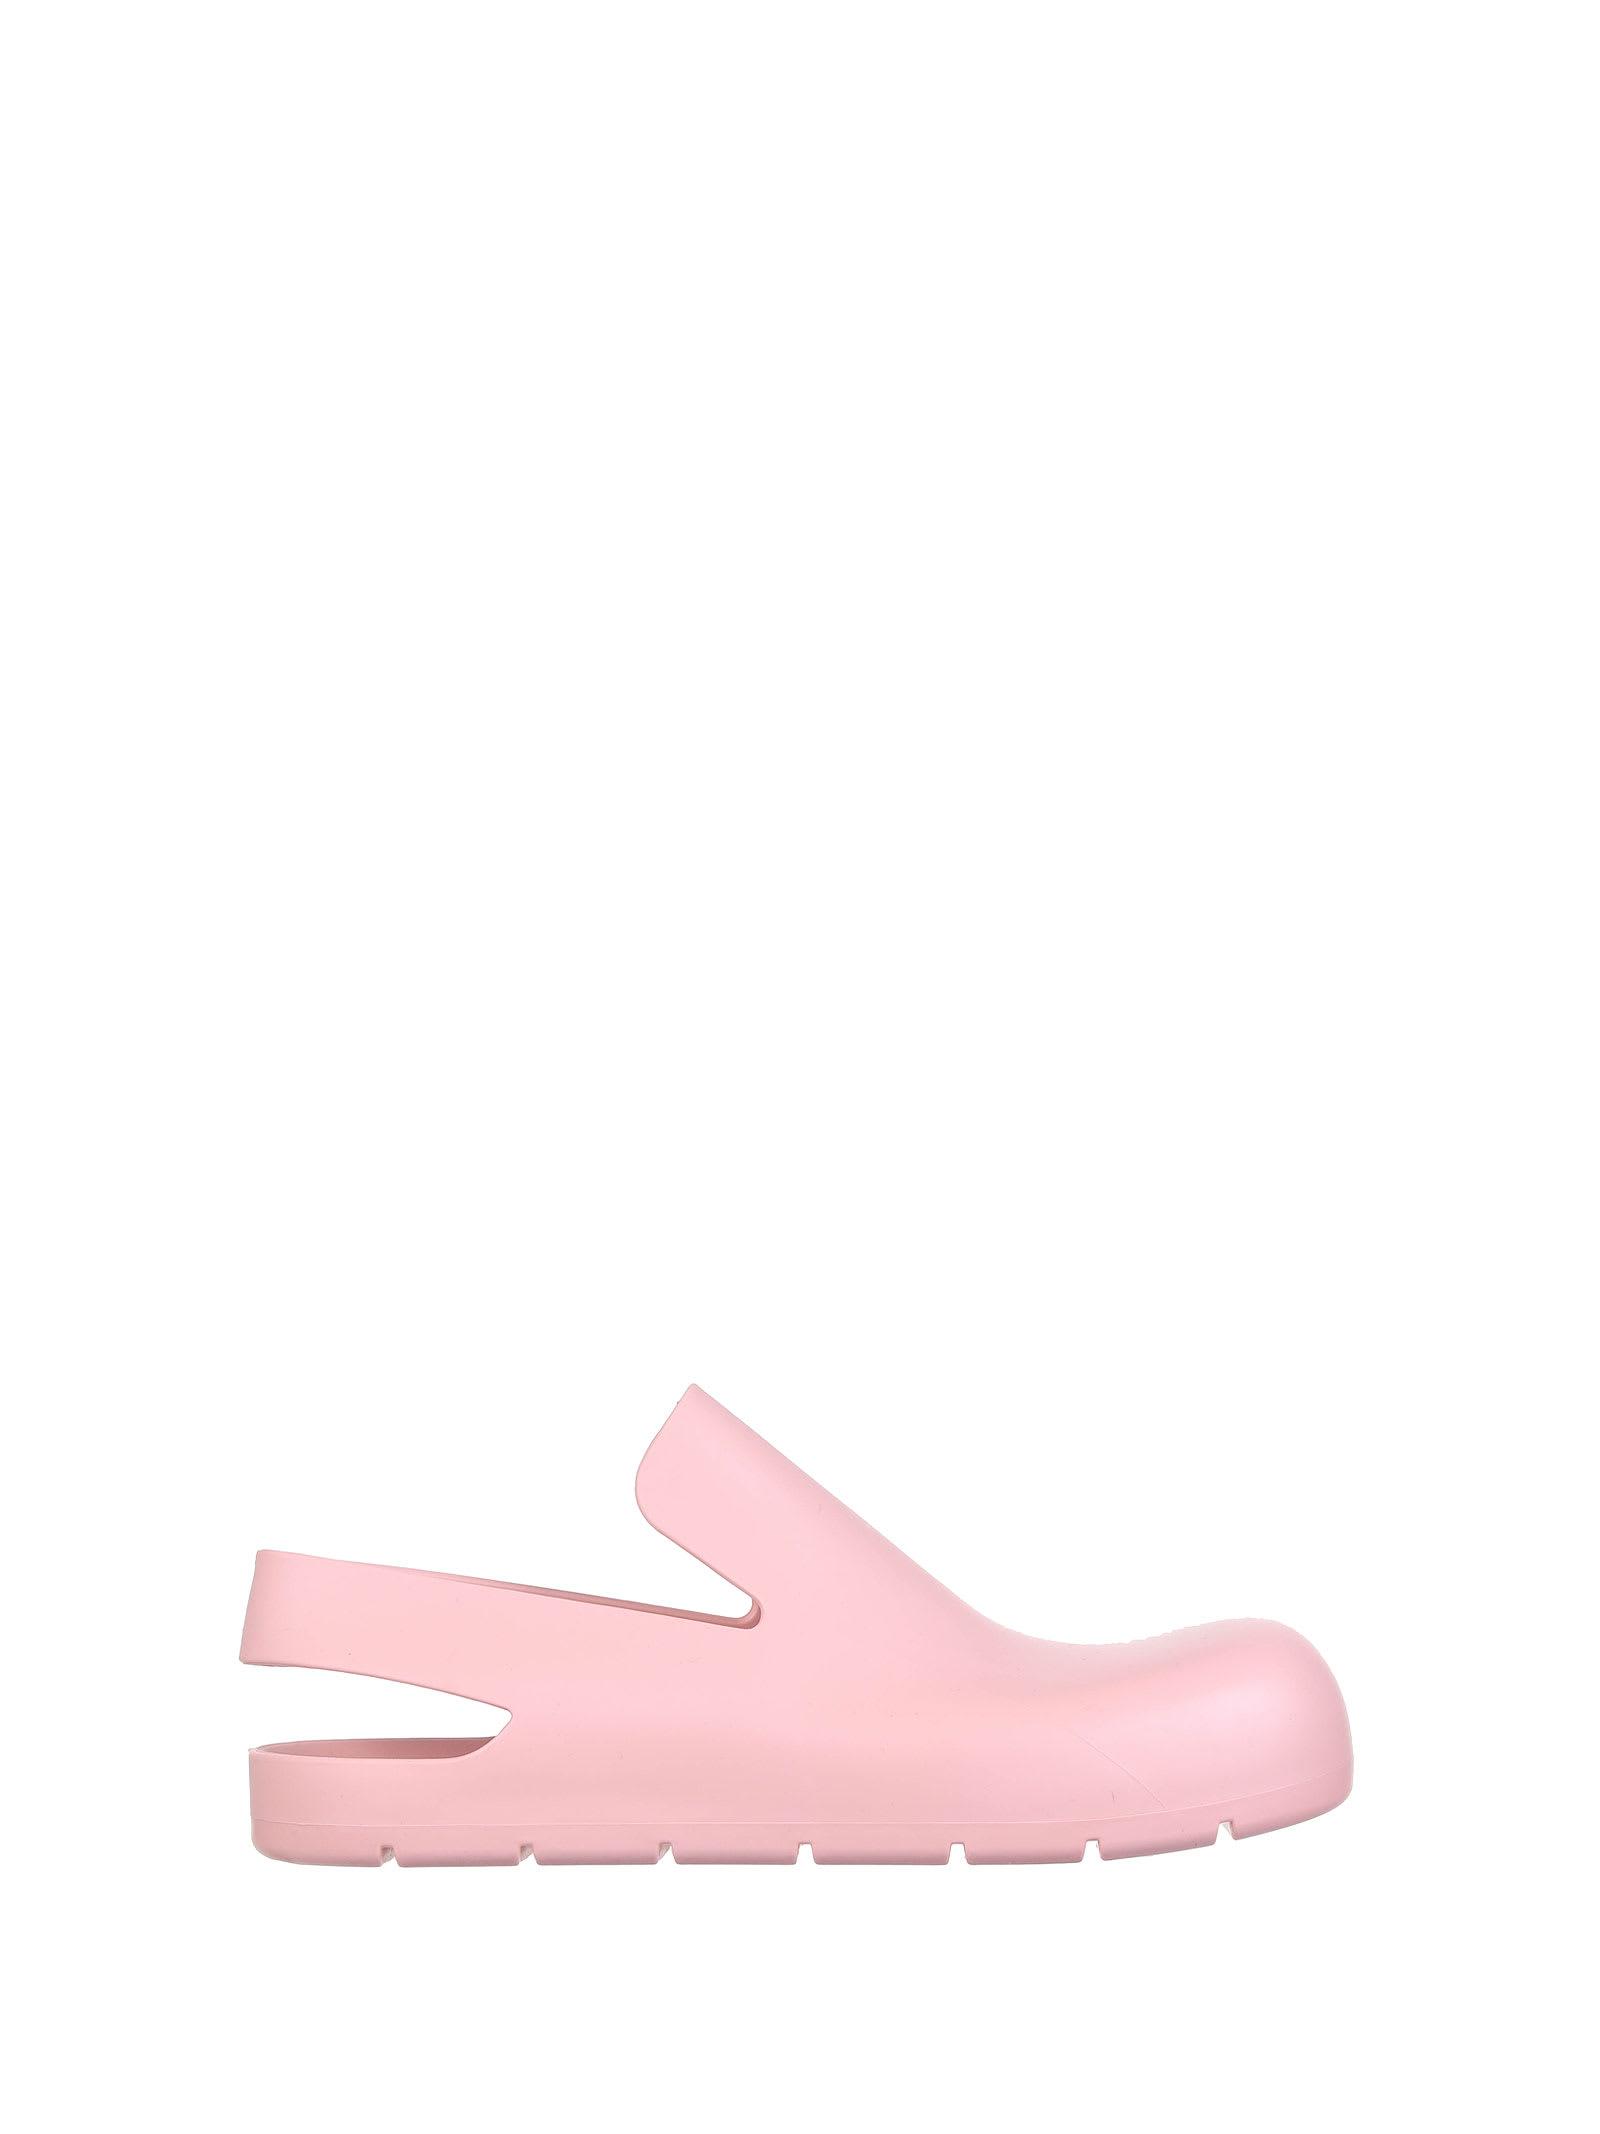 Buy Bottega Veneta Peachy Slides online, shop Bottega Veneta shoes with free shipping